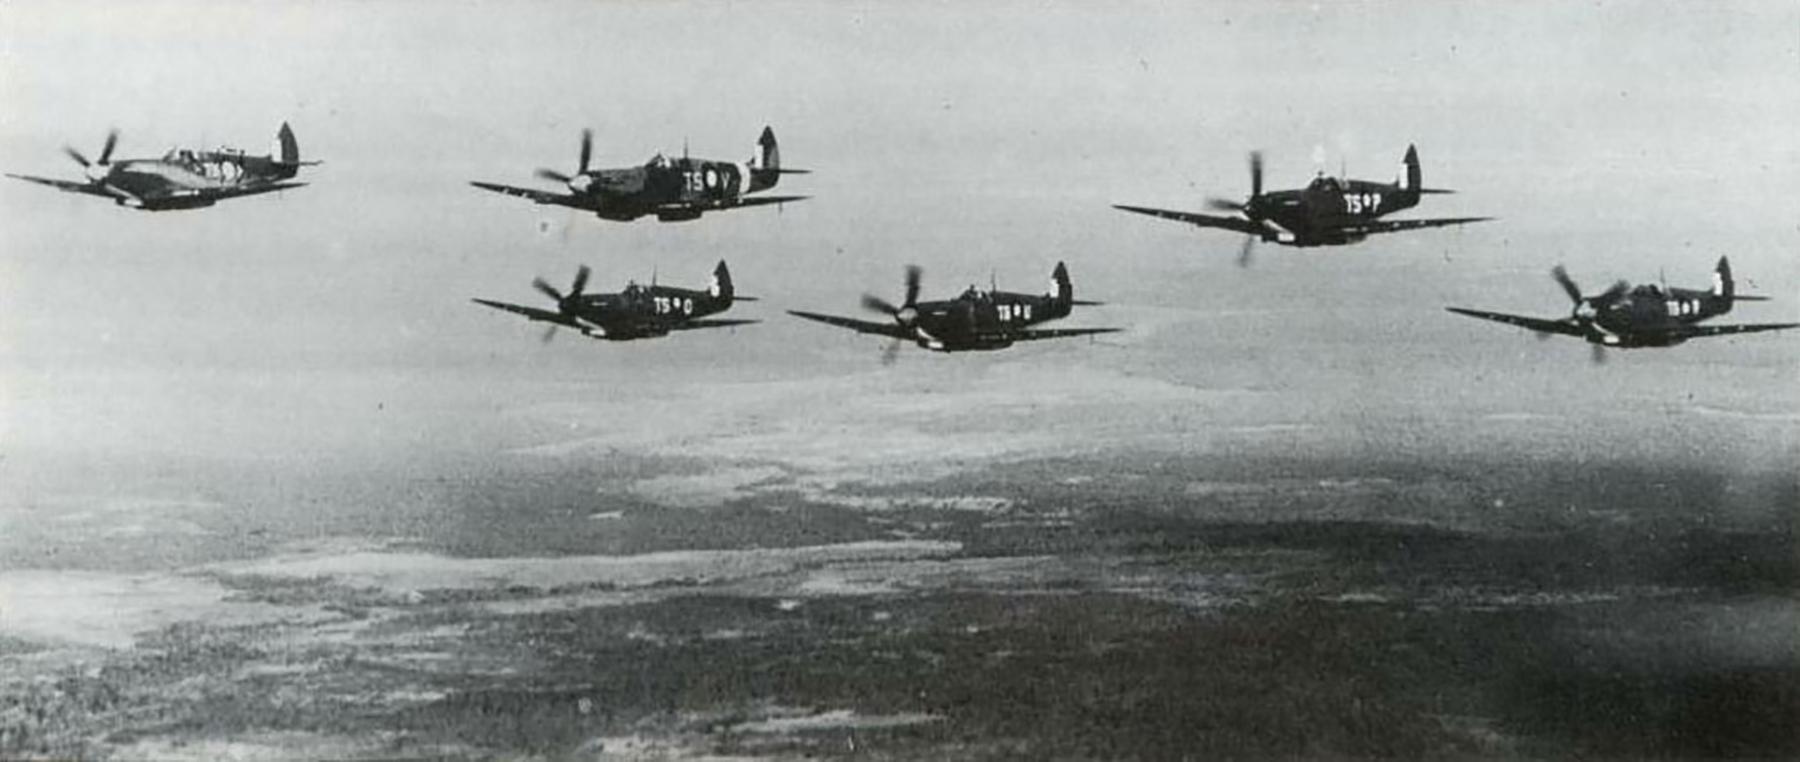 Spitfire LFVIII RAAF 548Sqn TSV JG422 A58 353 Queensland 1944 02